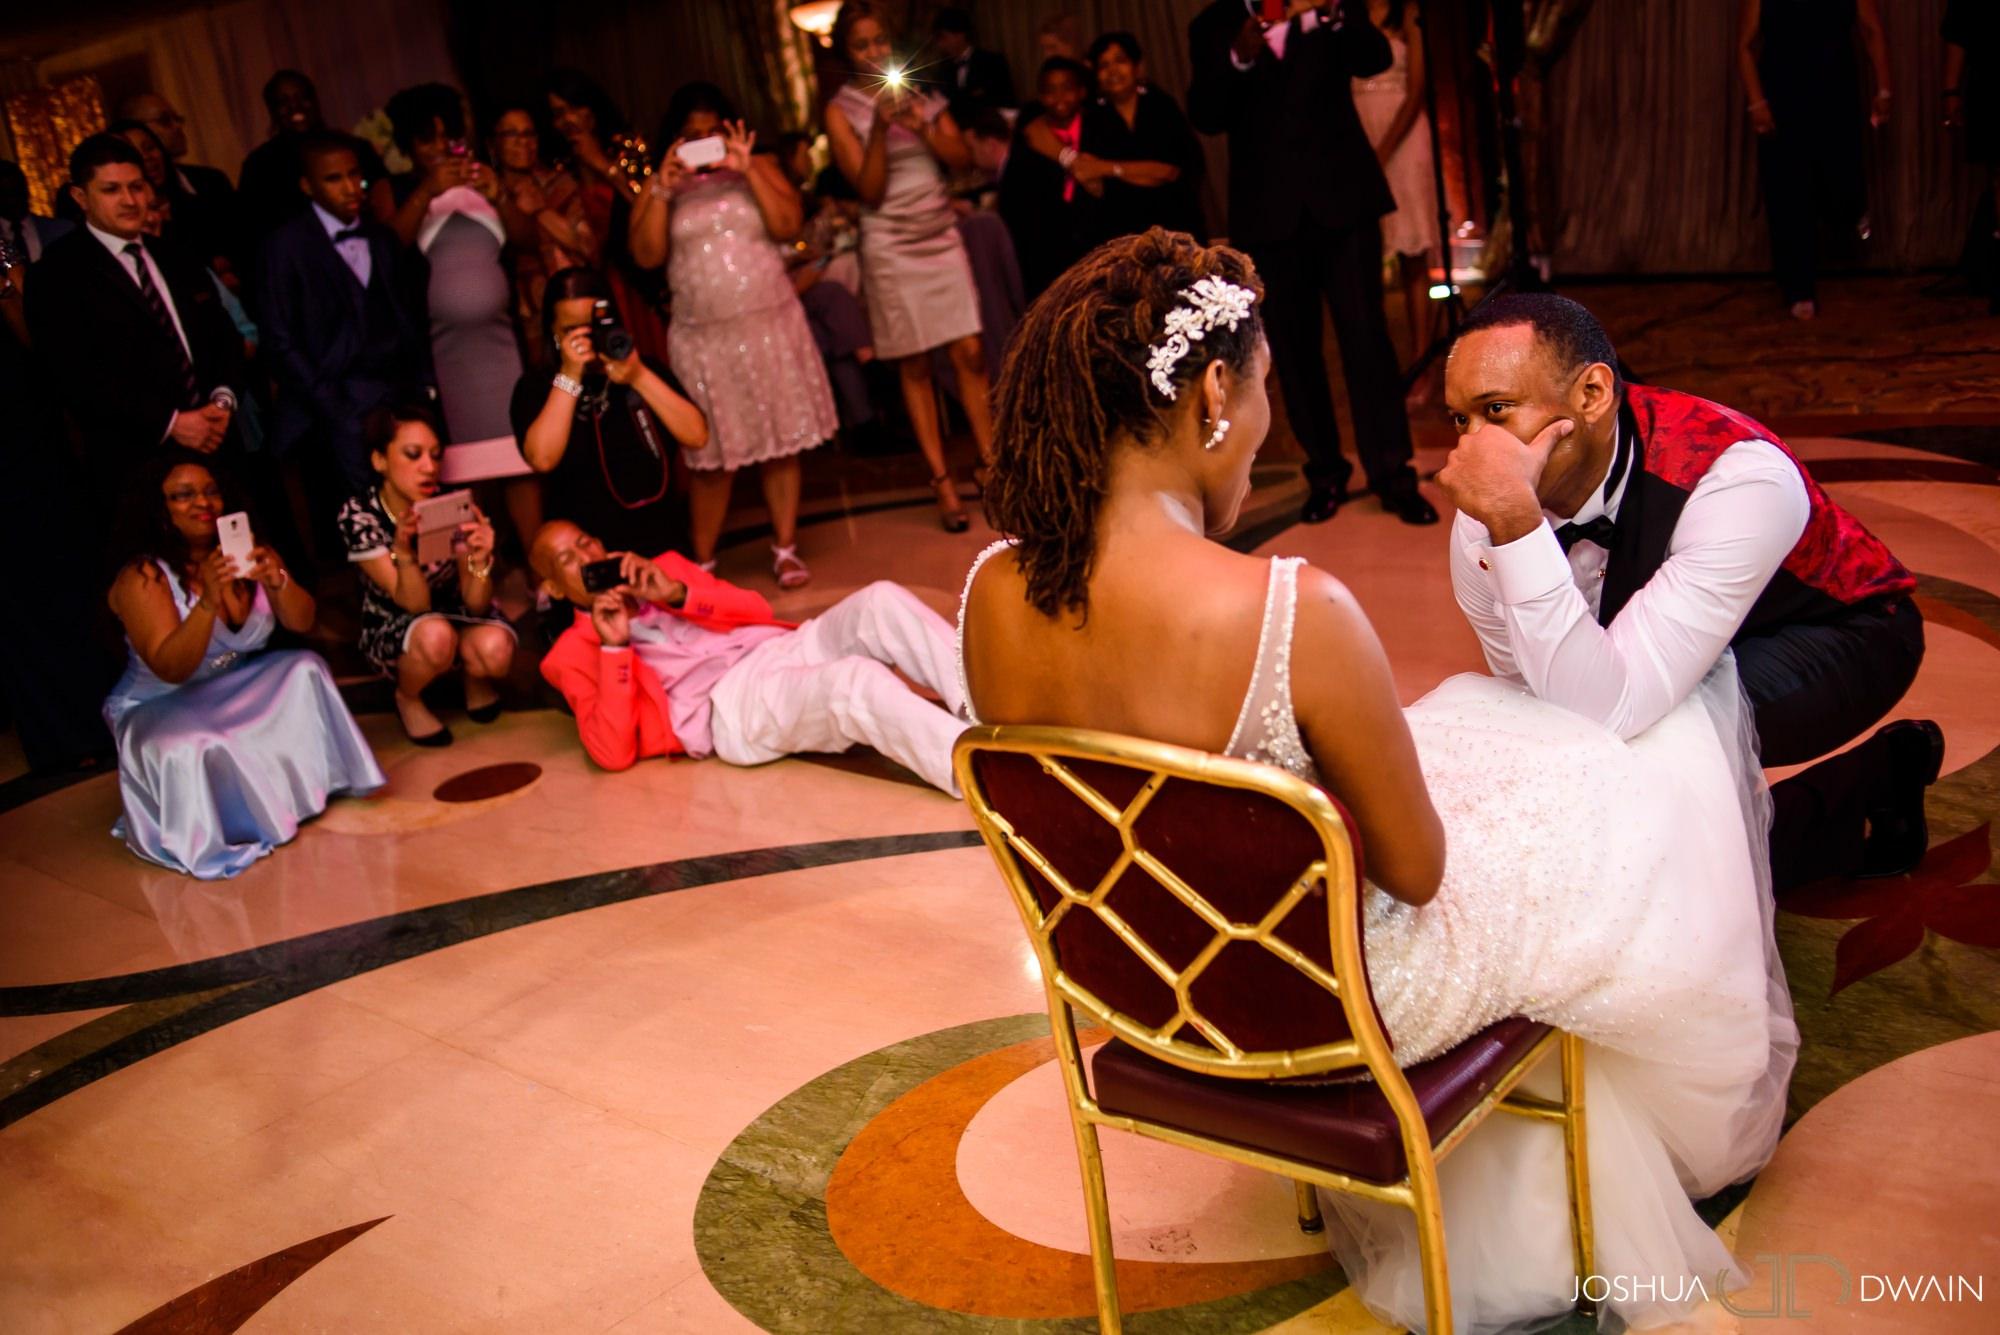 regine-jevon-032-26-crest-hollow-long-island-wedding-photographer-joshua-dwain